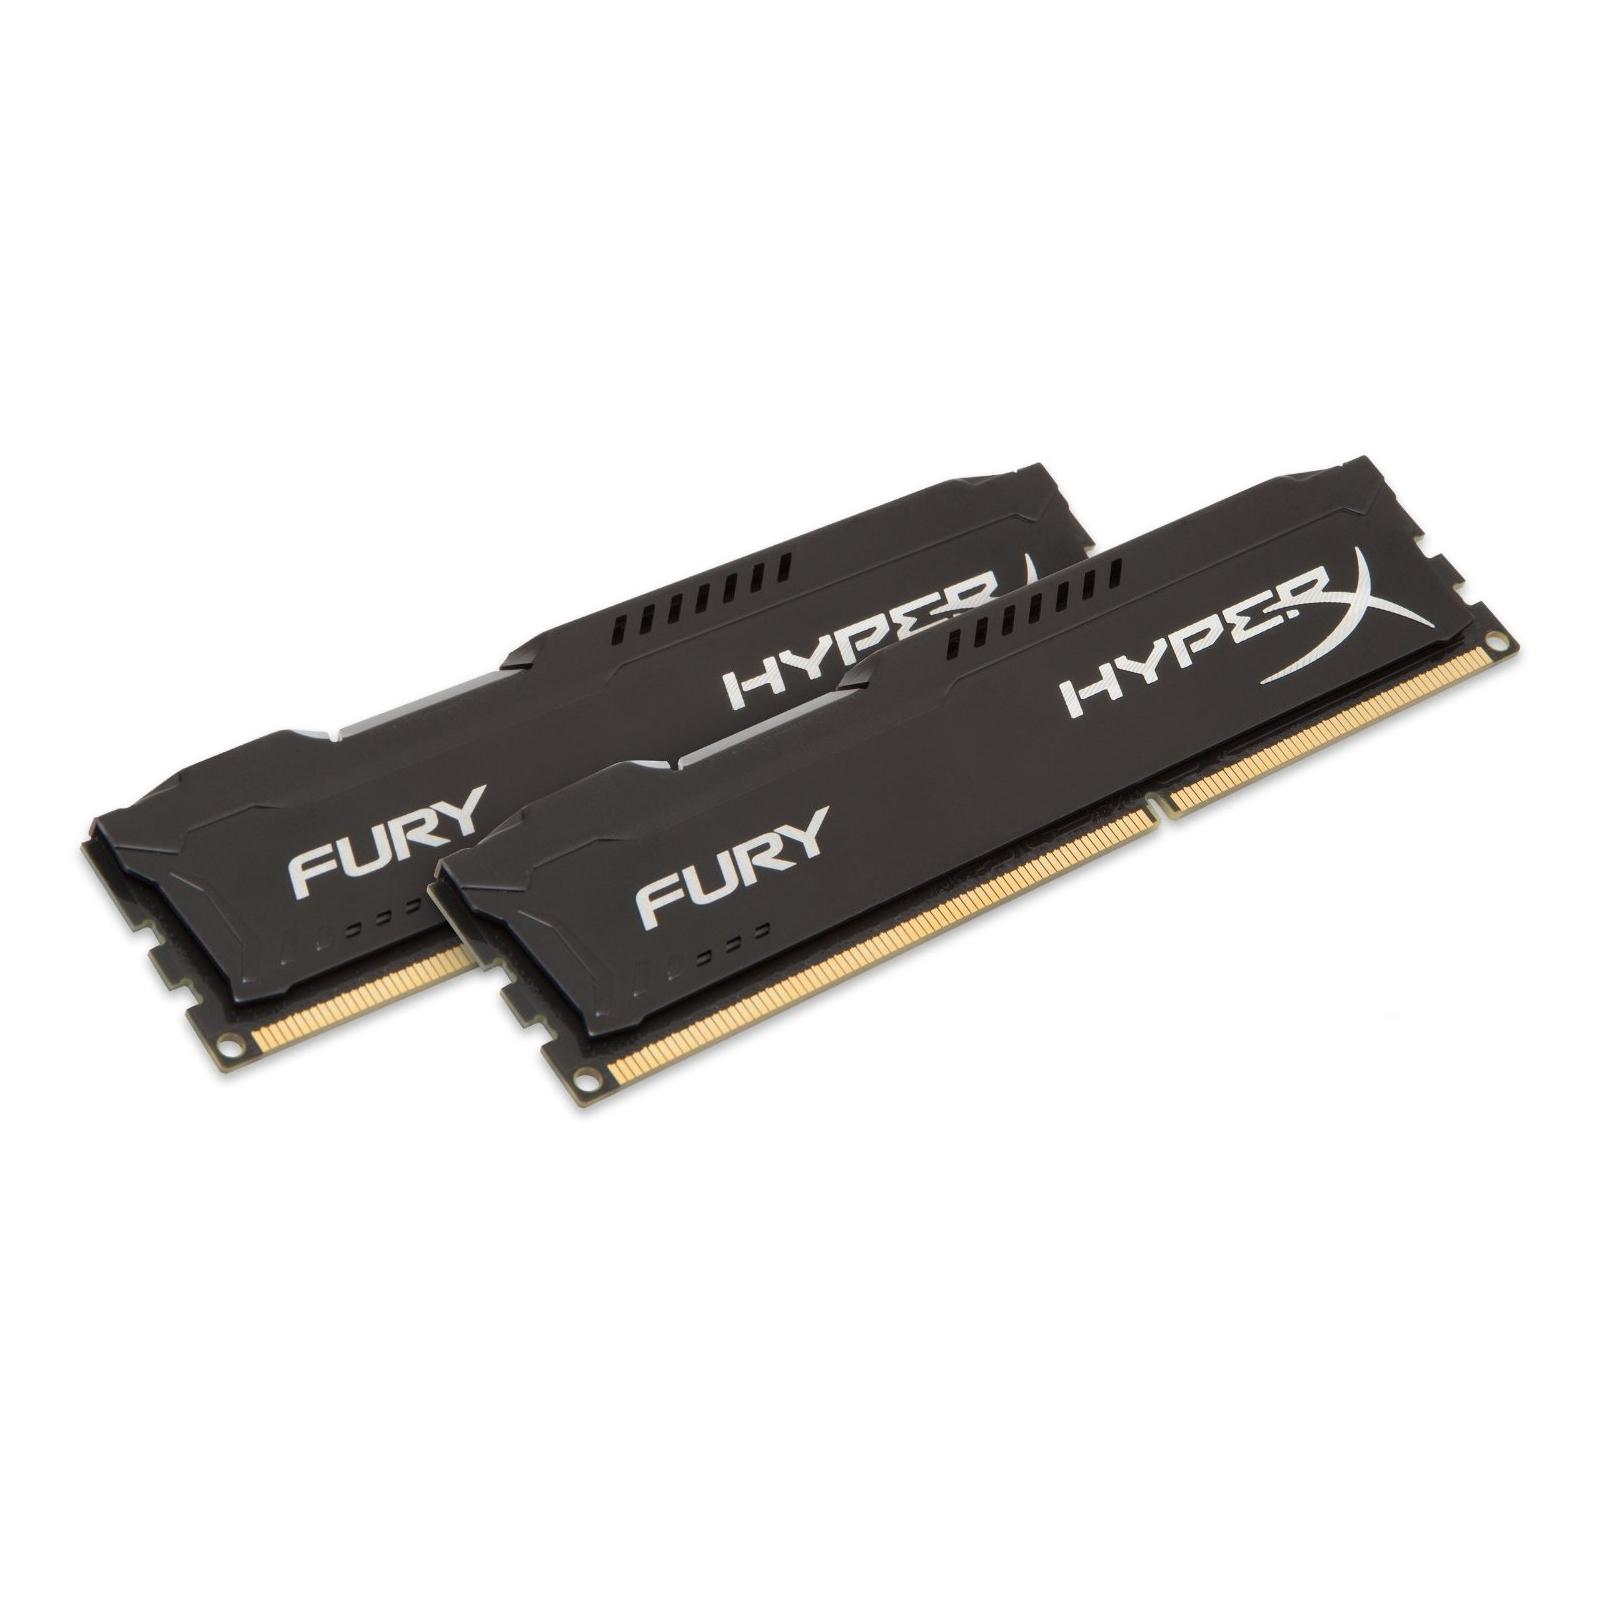 Модуль памяти для компьютера 16Gb DDR3 1600M Hz HyperX Fury Black (2x8GB) Kingston (HX316C10FBK2/16) изображение 2